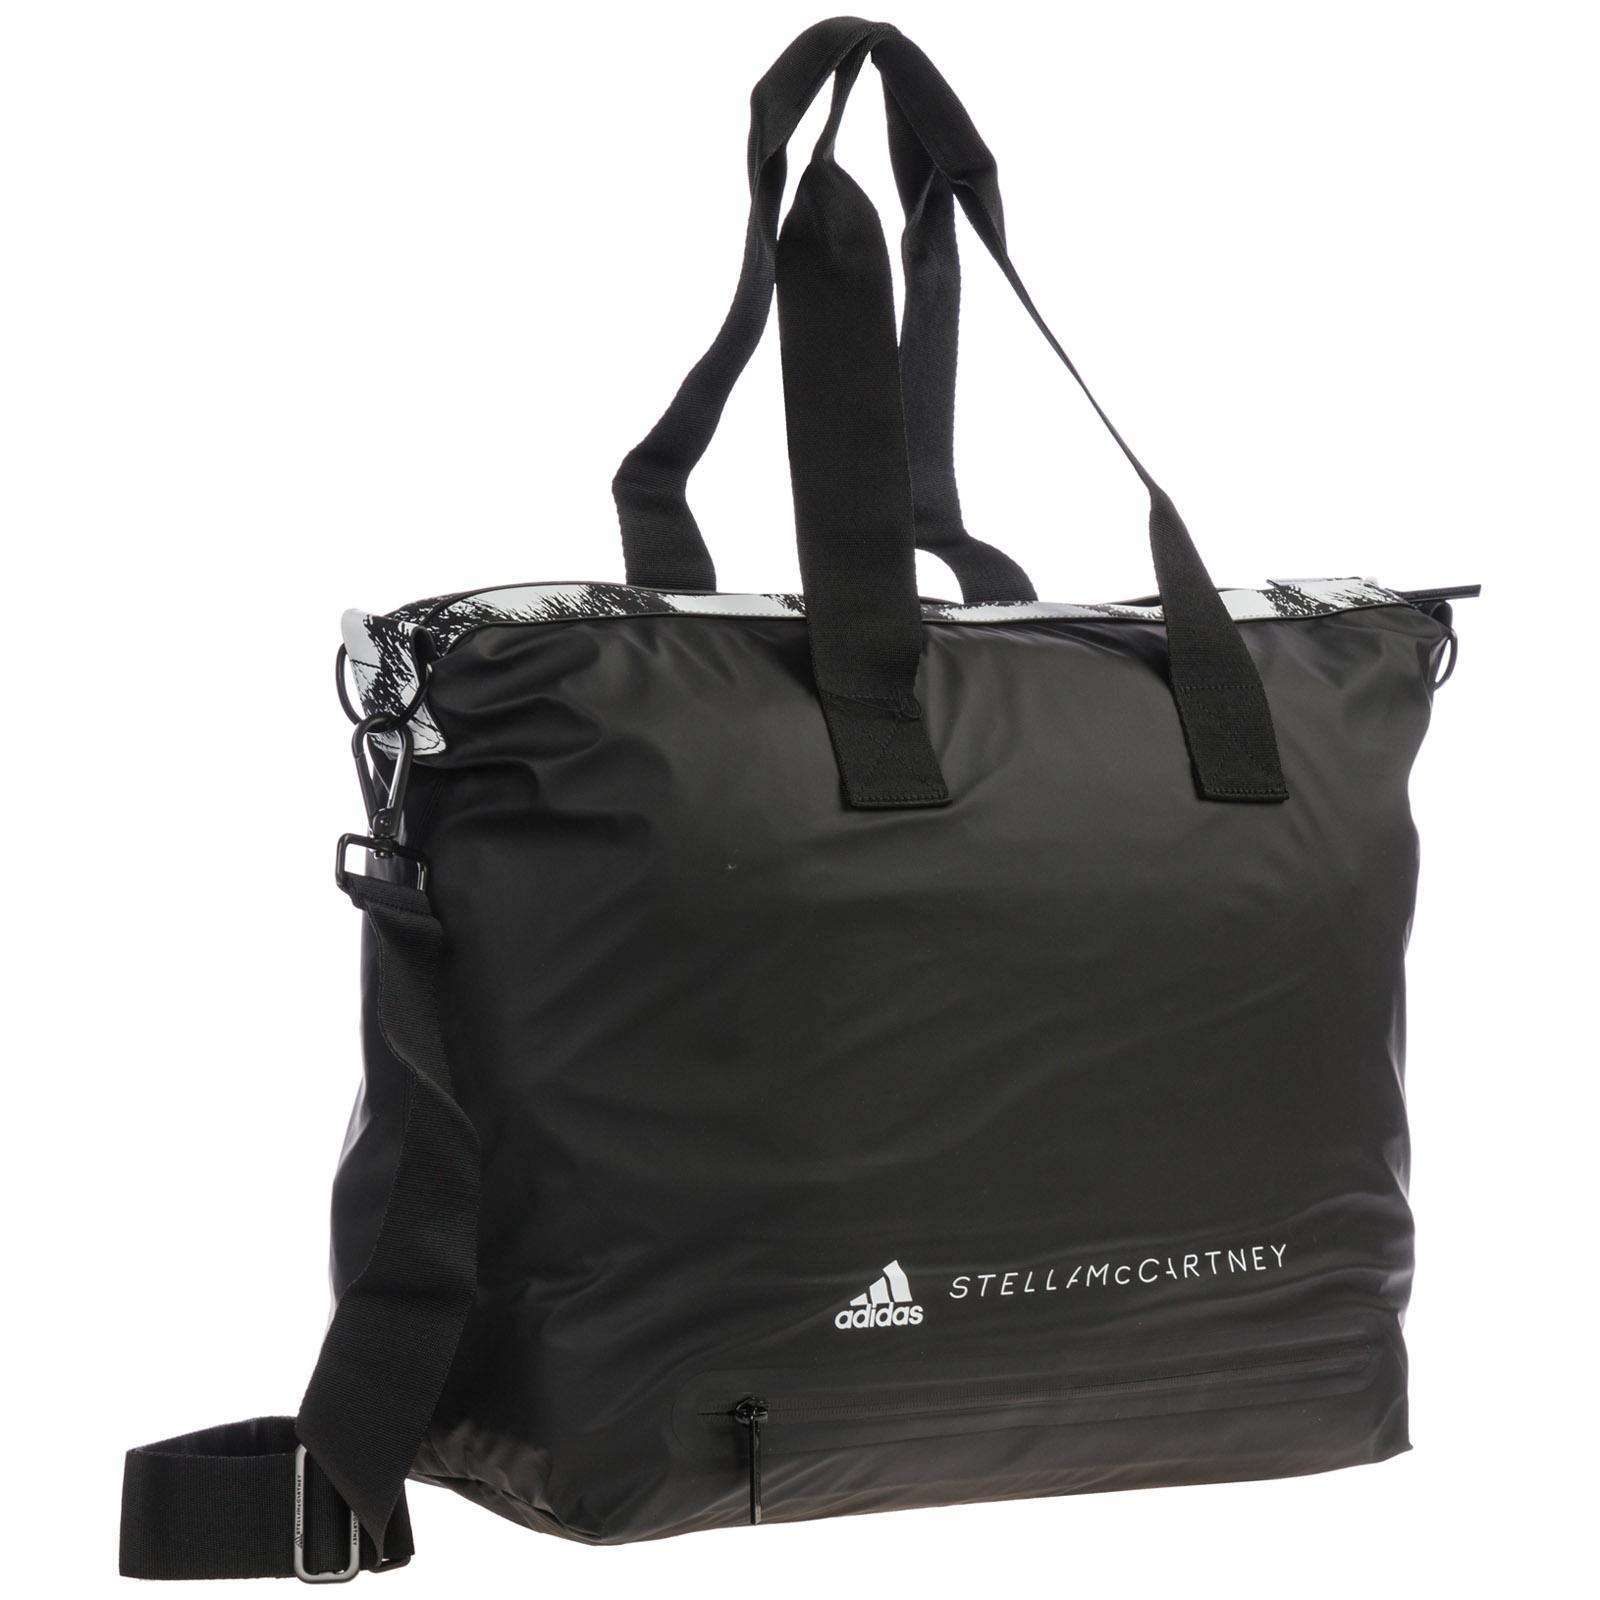 53bf2a22 Спортивная сумка Adidas by Stella McCartney Studio bag DT5427 nero ...